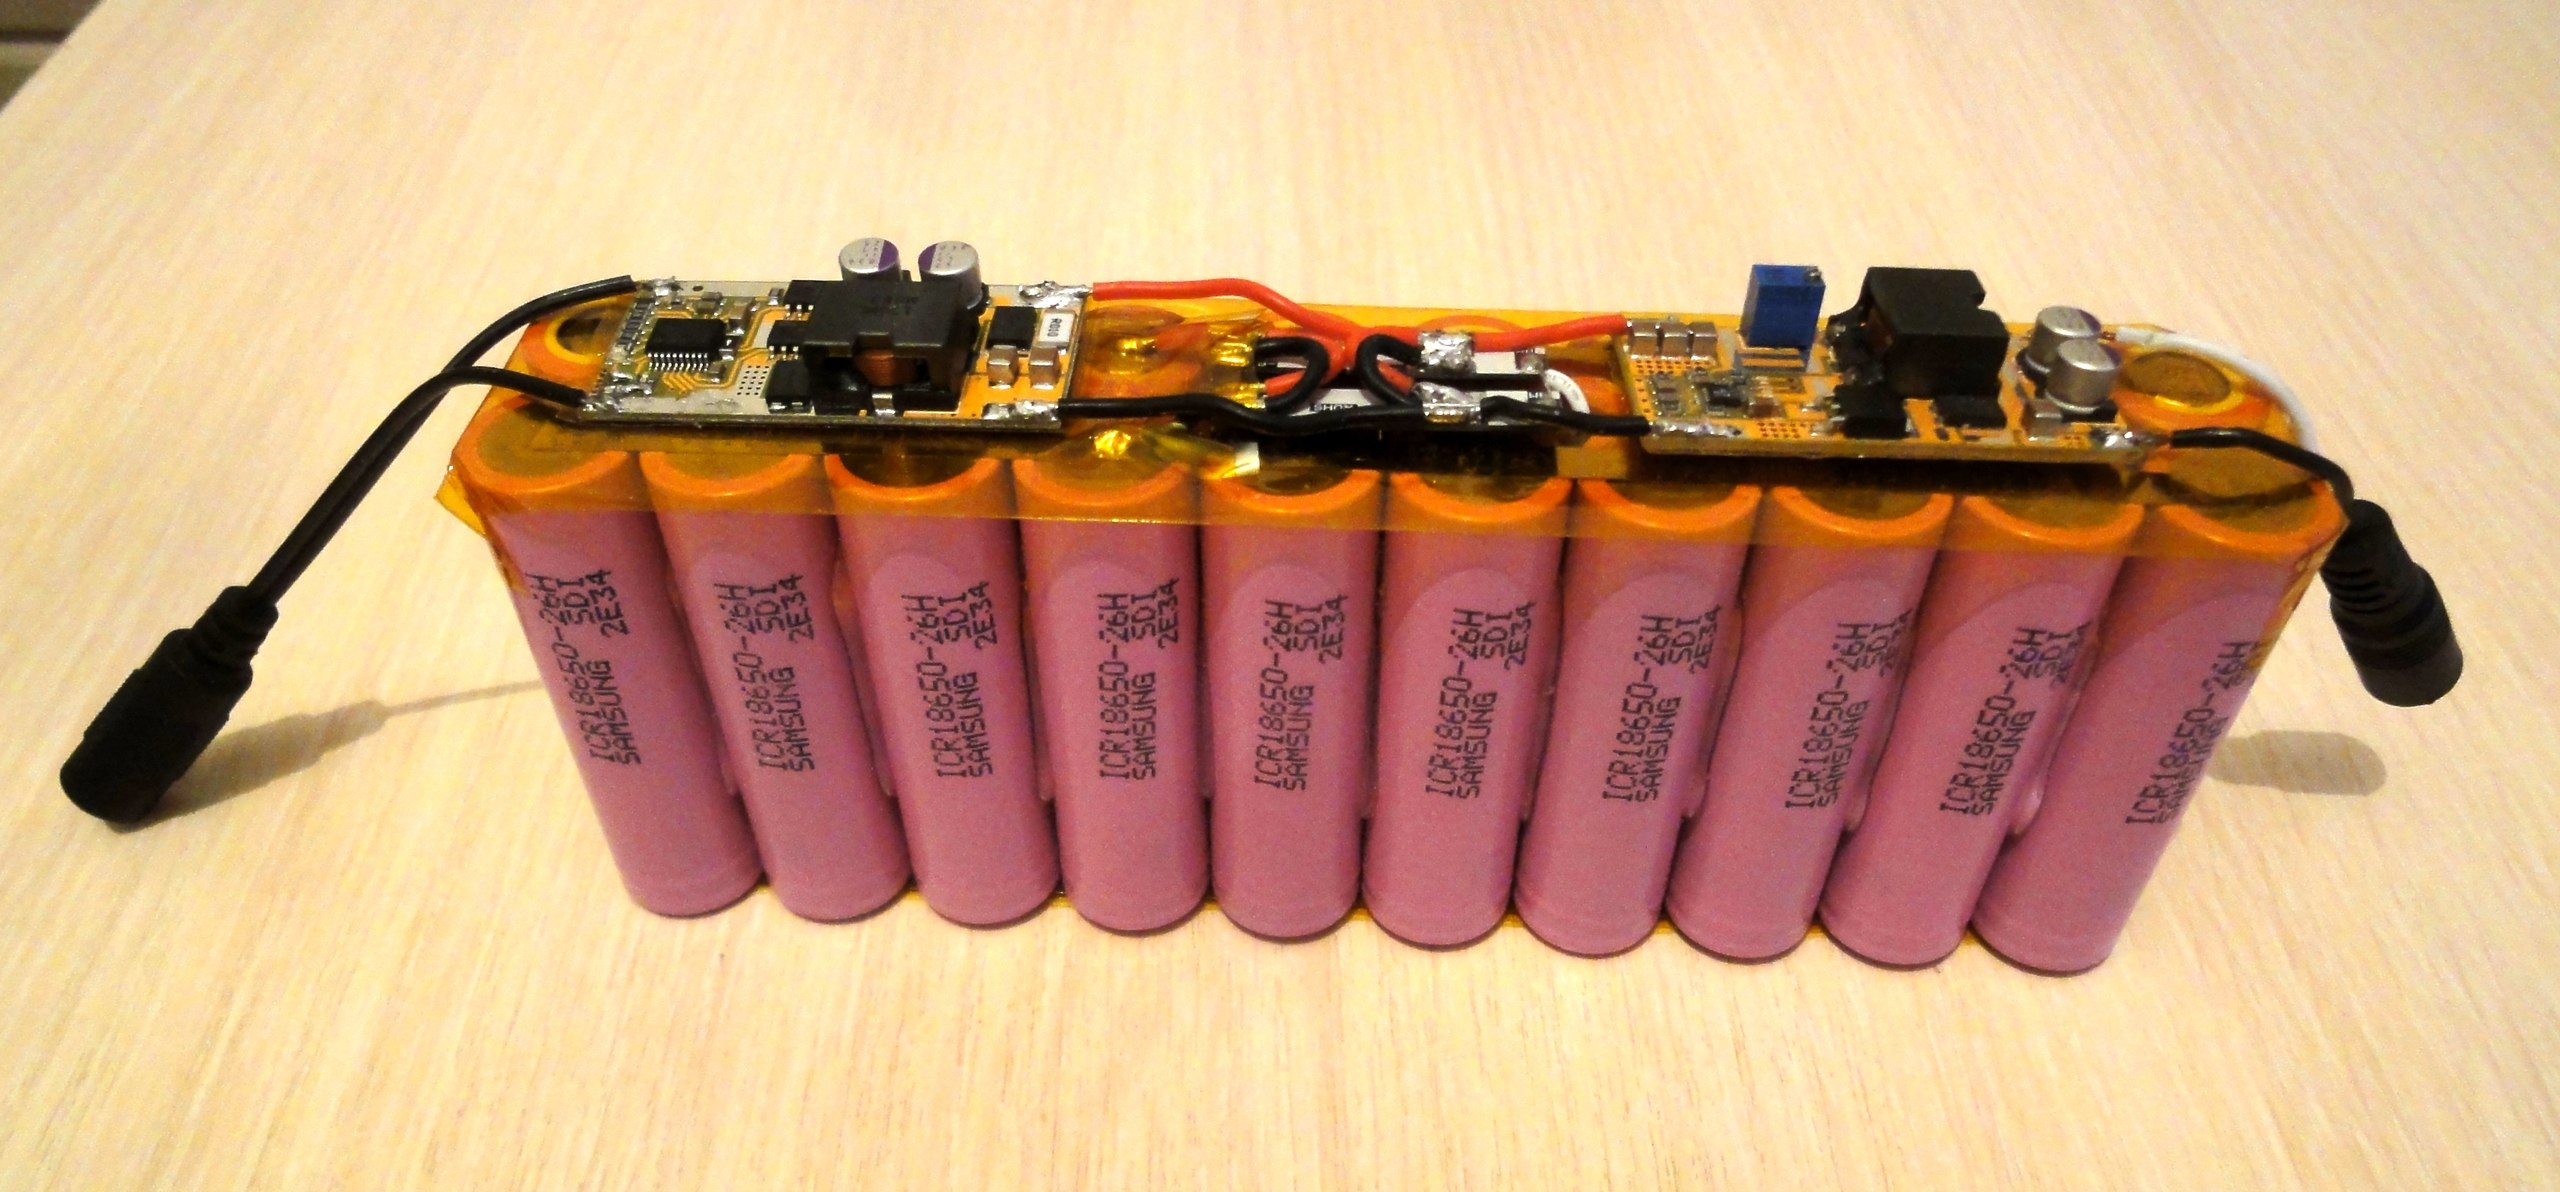 Power bank своими руками из аккумулятора 54